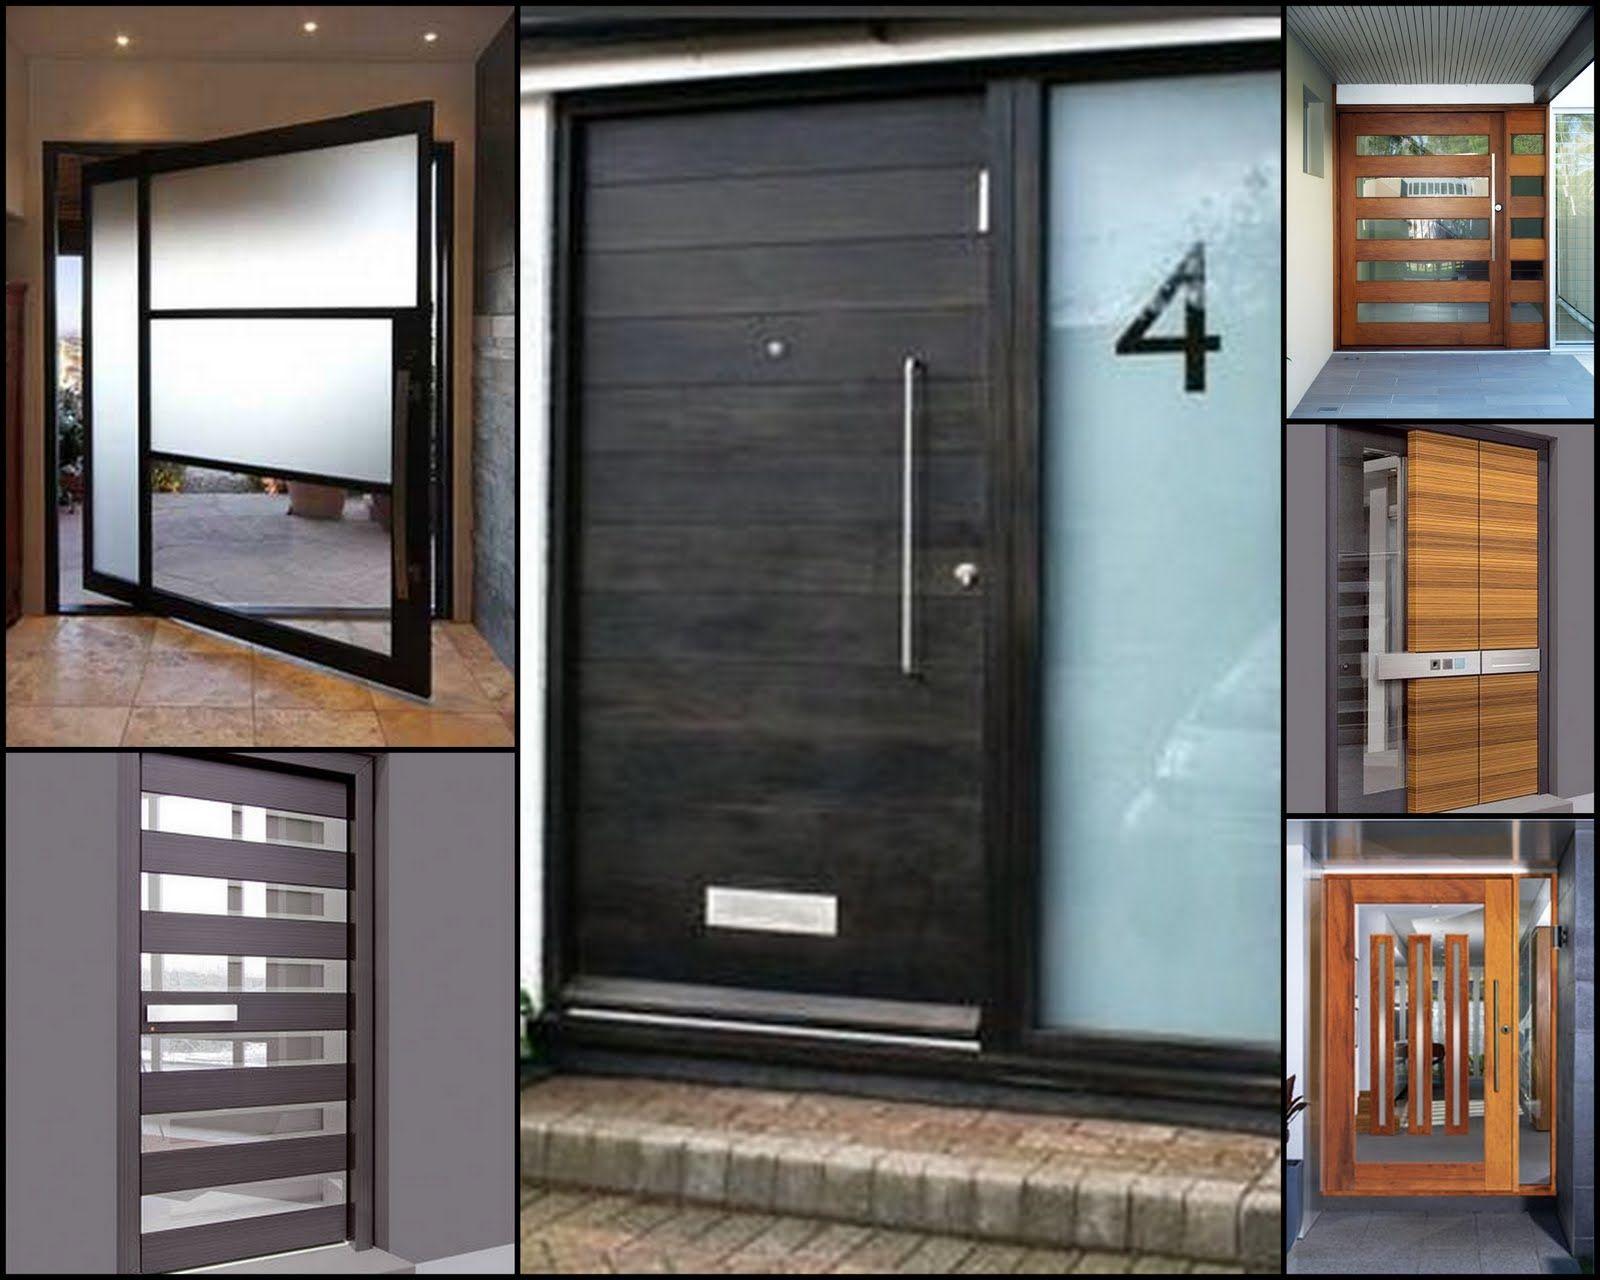 Best Kitchen Gallery: Modern Wood Front Doors Homes Thewrightstuff Us Pinterest of Front Doors For Homes on rachelxblog.com